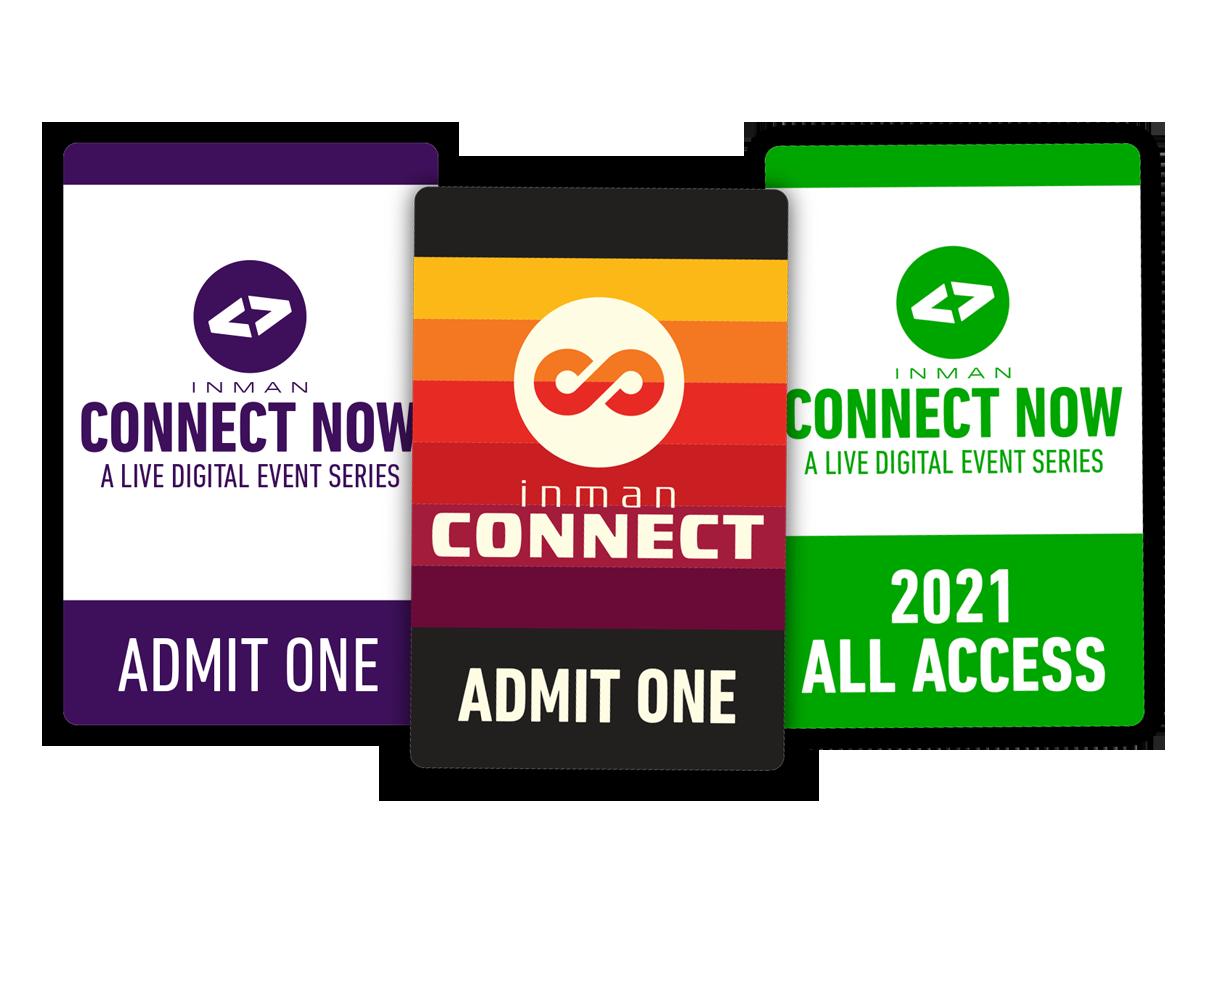 Connect Now 2021 All Access Bundle